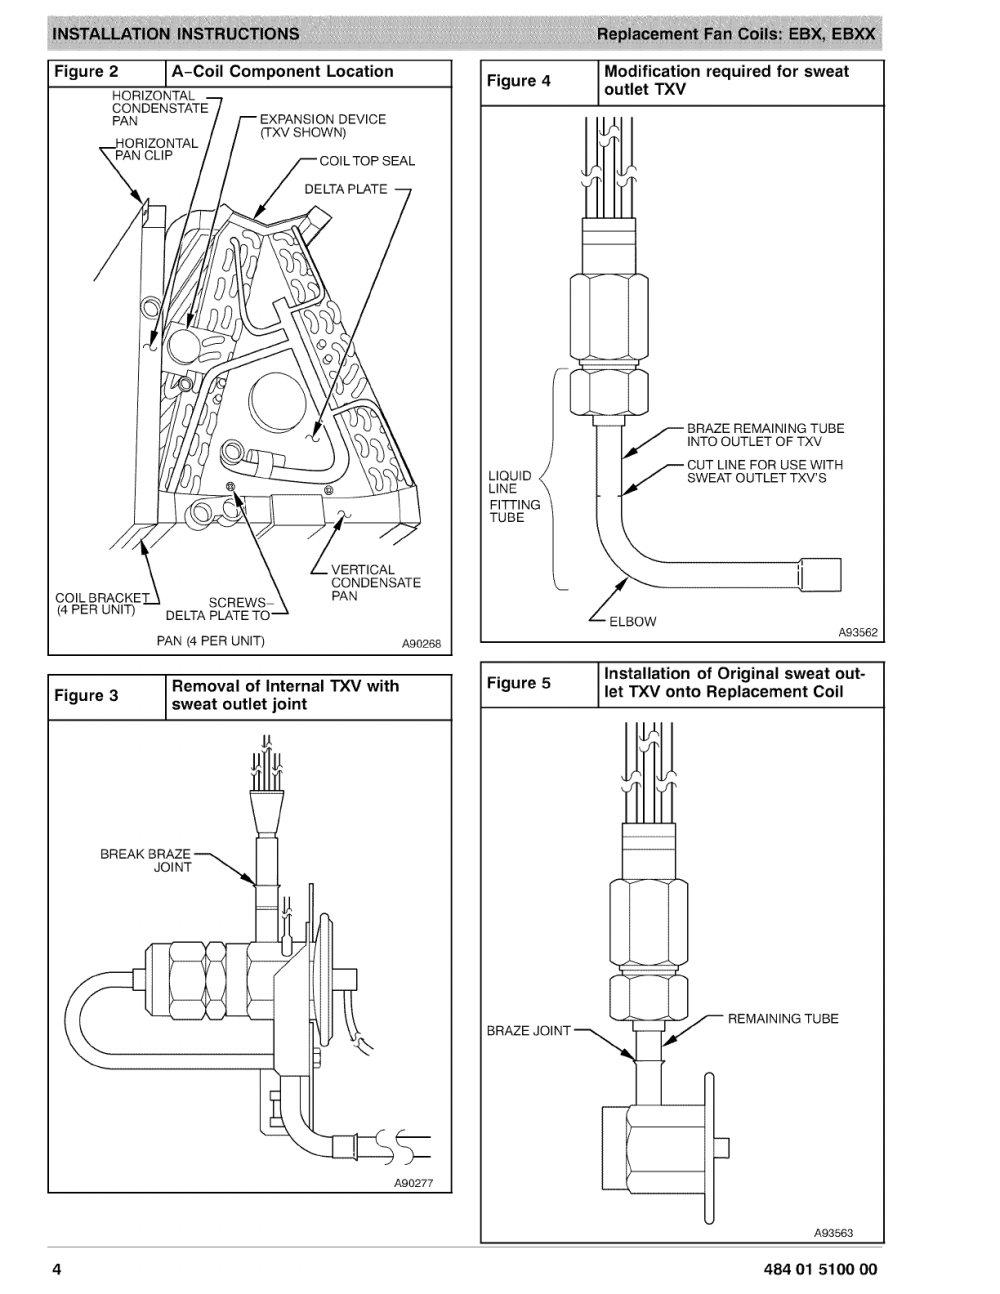 medium resolution of figure2 ja coil componentlocation